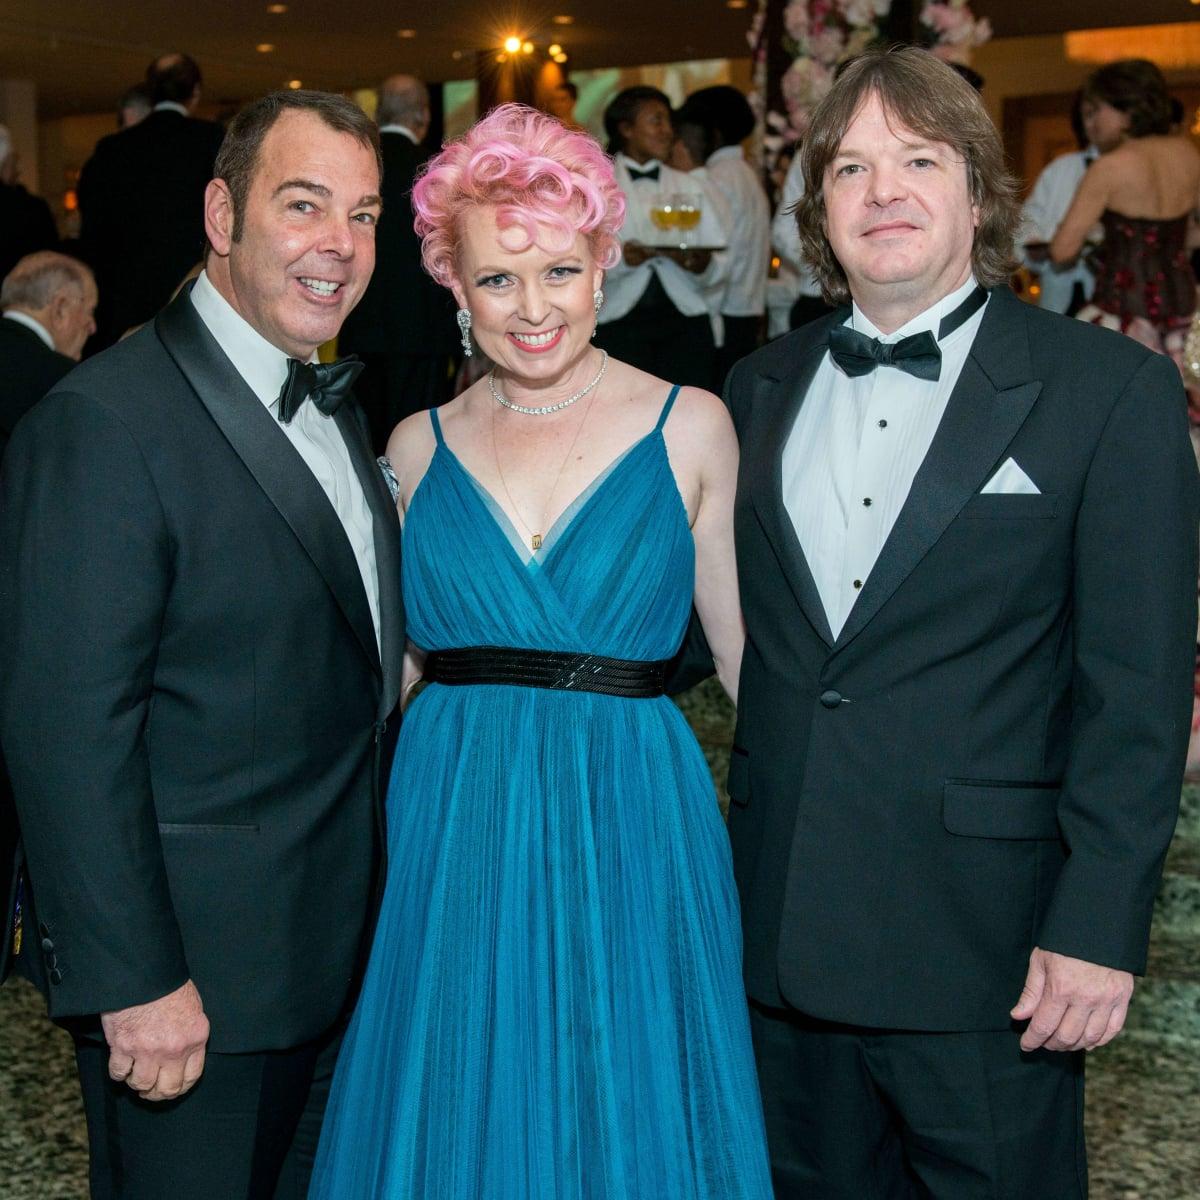 Mike Stinson, Vivian Wise, Peter Martino at Museum of Fine Arts Houston Grand Gala